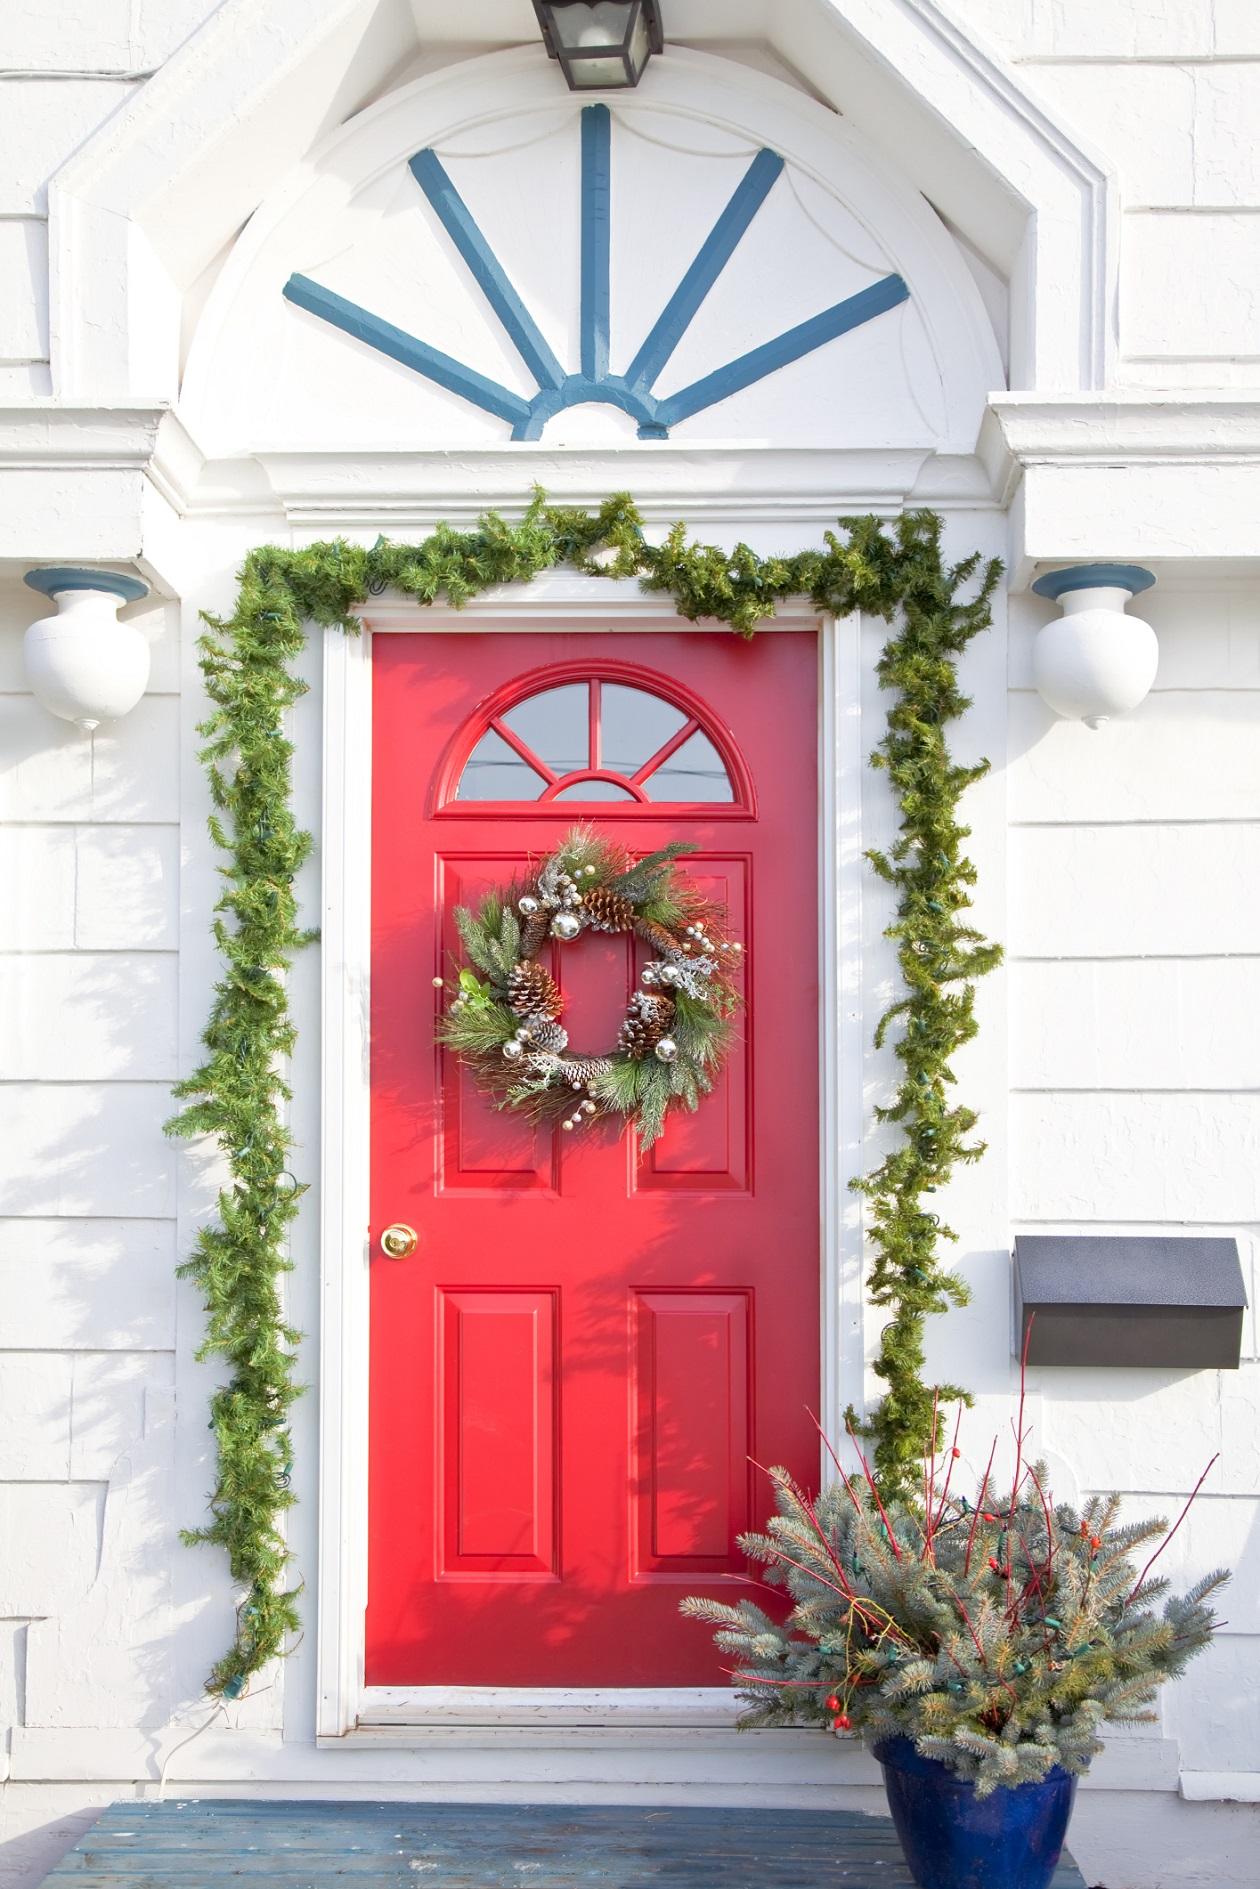 Puertas decoradas de navidad 3 1 - Puertas de navidad ...